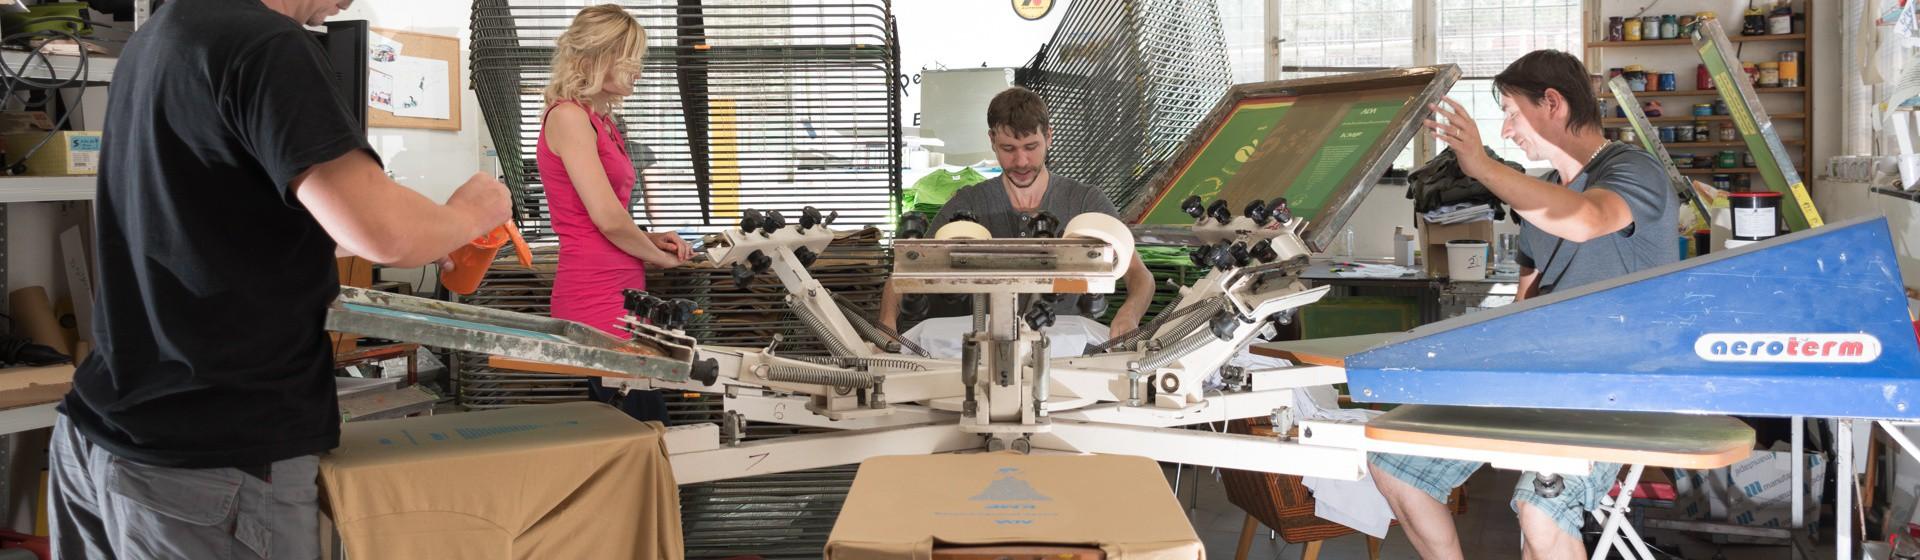 Výroba tričiek